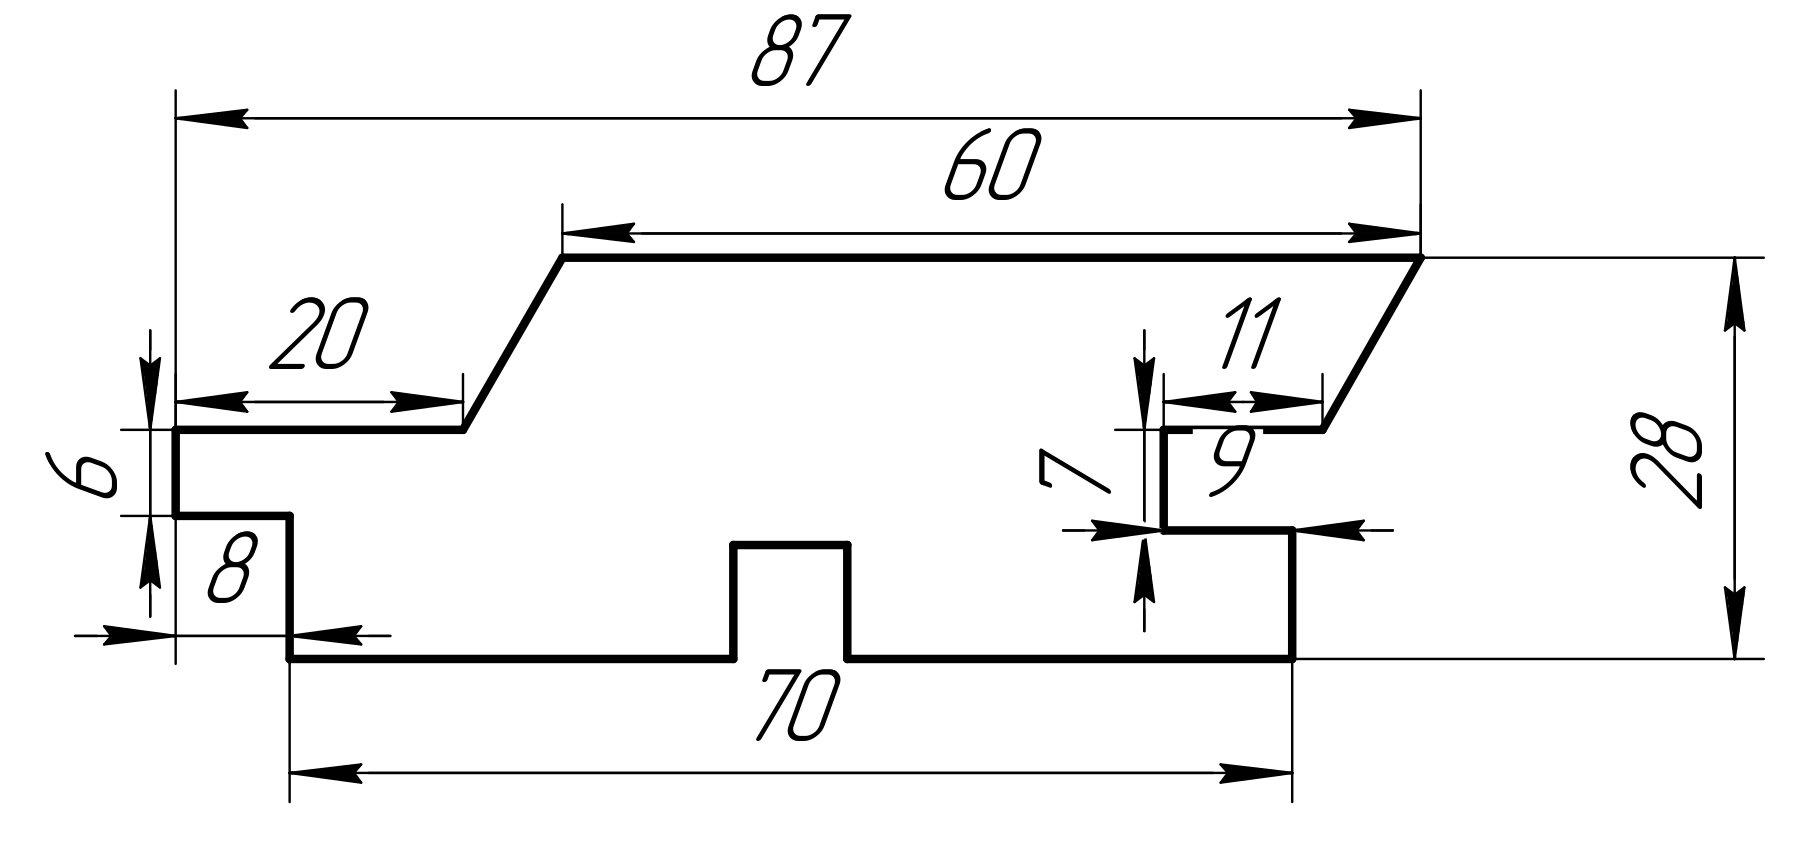 Drvene fasade Fasadna daska  28 x 87  ARIX-Elegant od Sibirskog Ariša ARIX